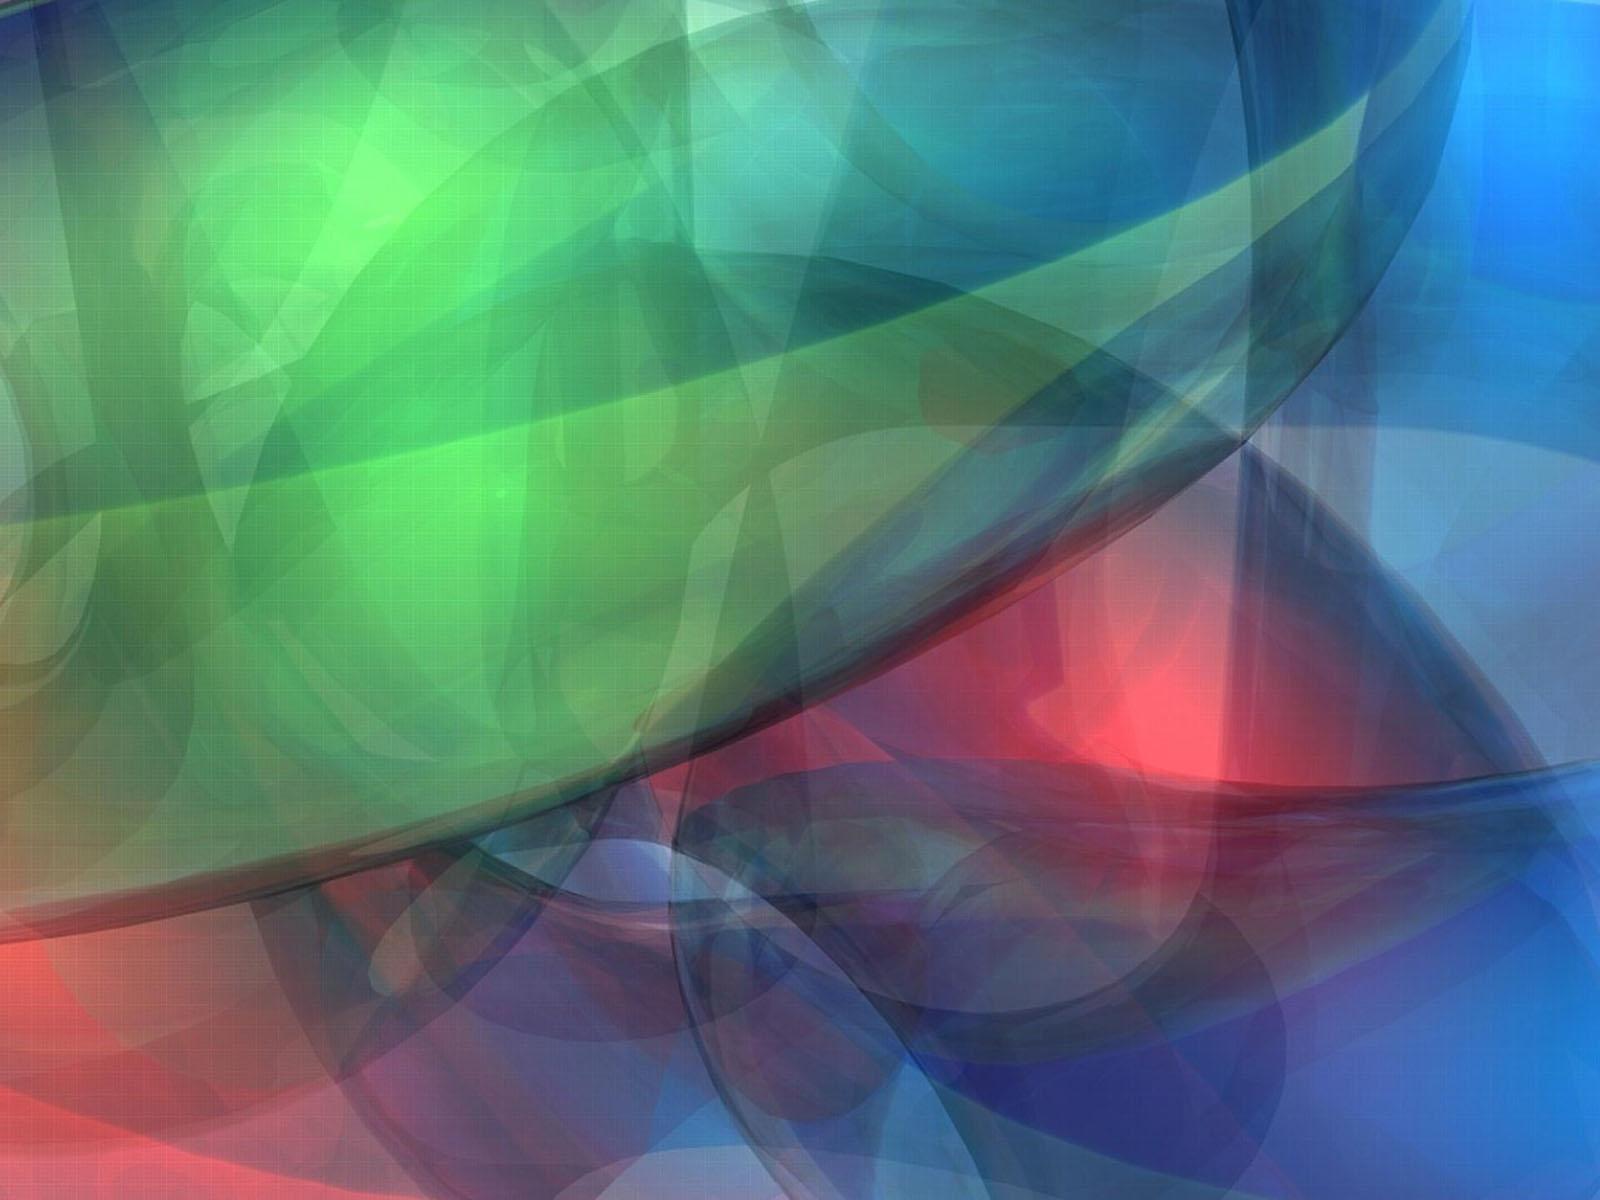 Cute Teddy Wallpapers For Desktop Wallpapers Color Blobs Wallpapers